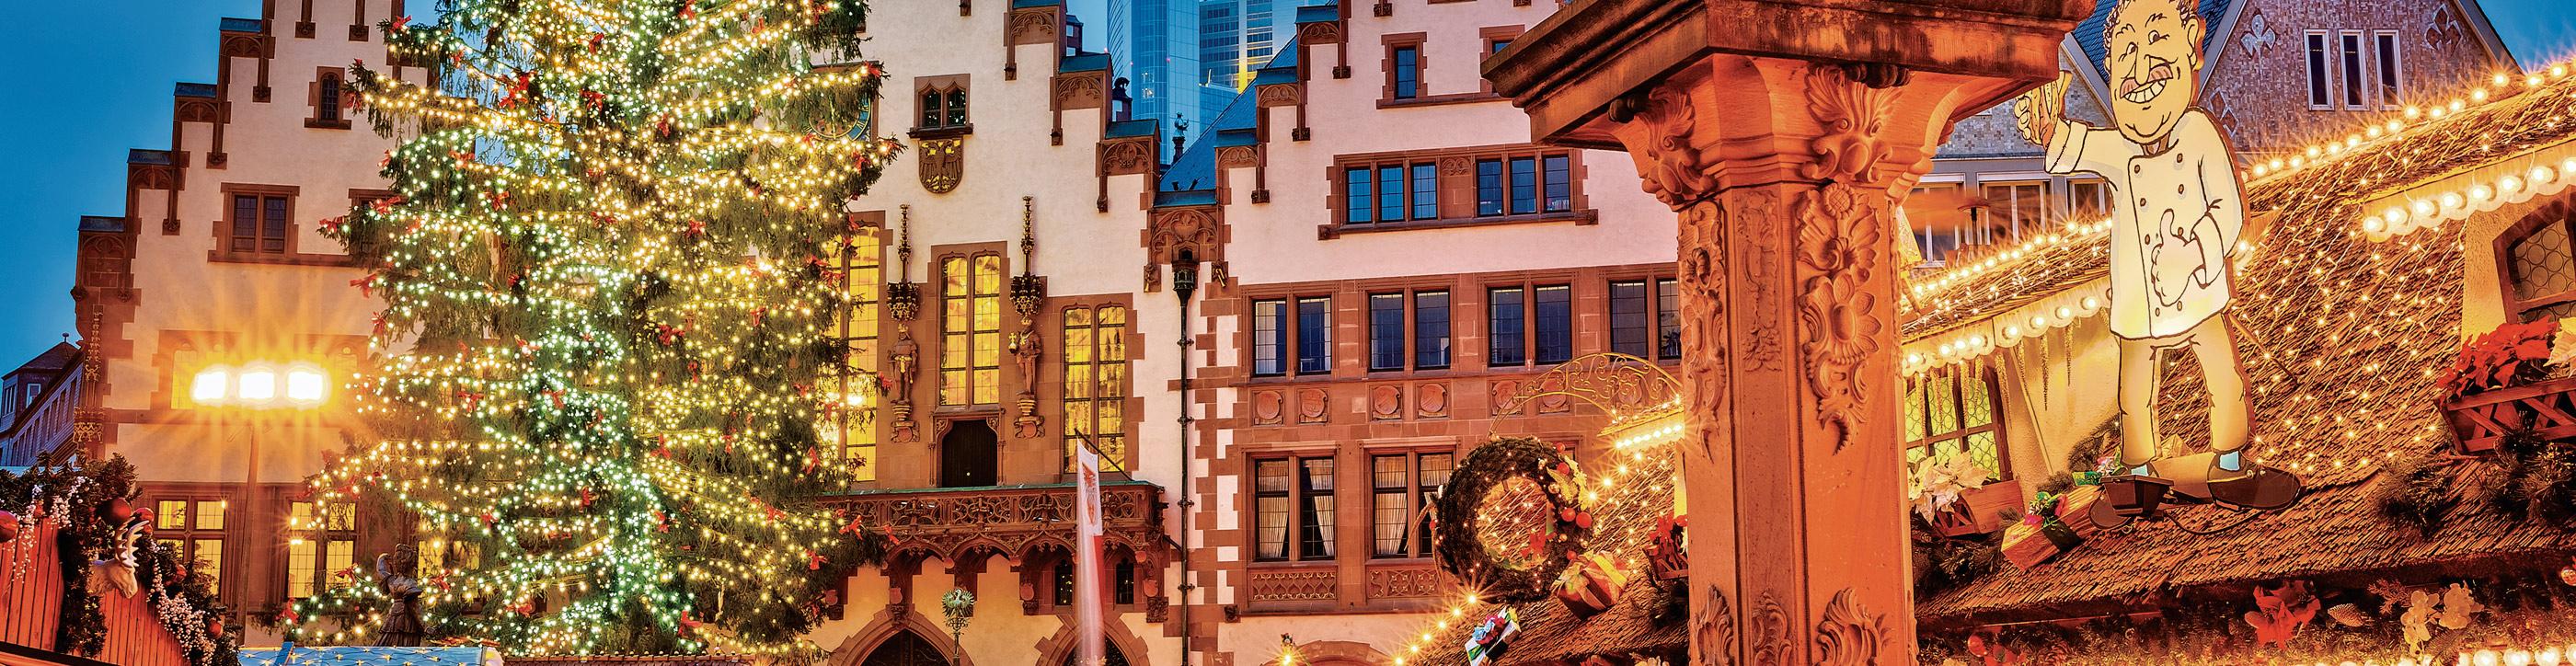 Classic Christmas Markets 2018 | Europe River Cruise | Uniworld ...